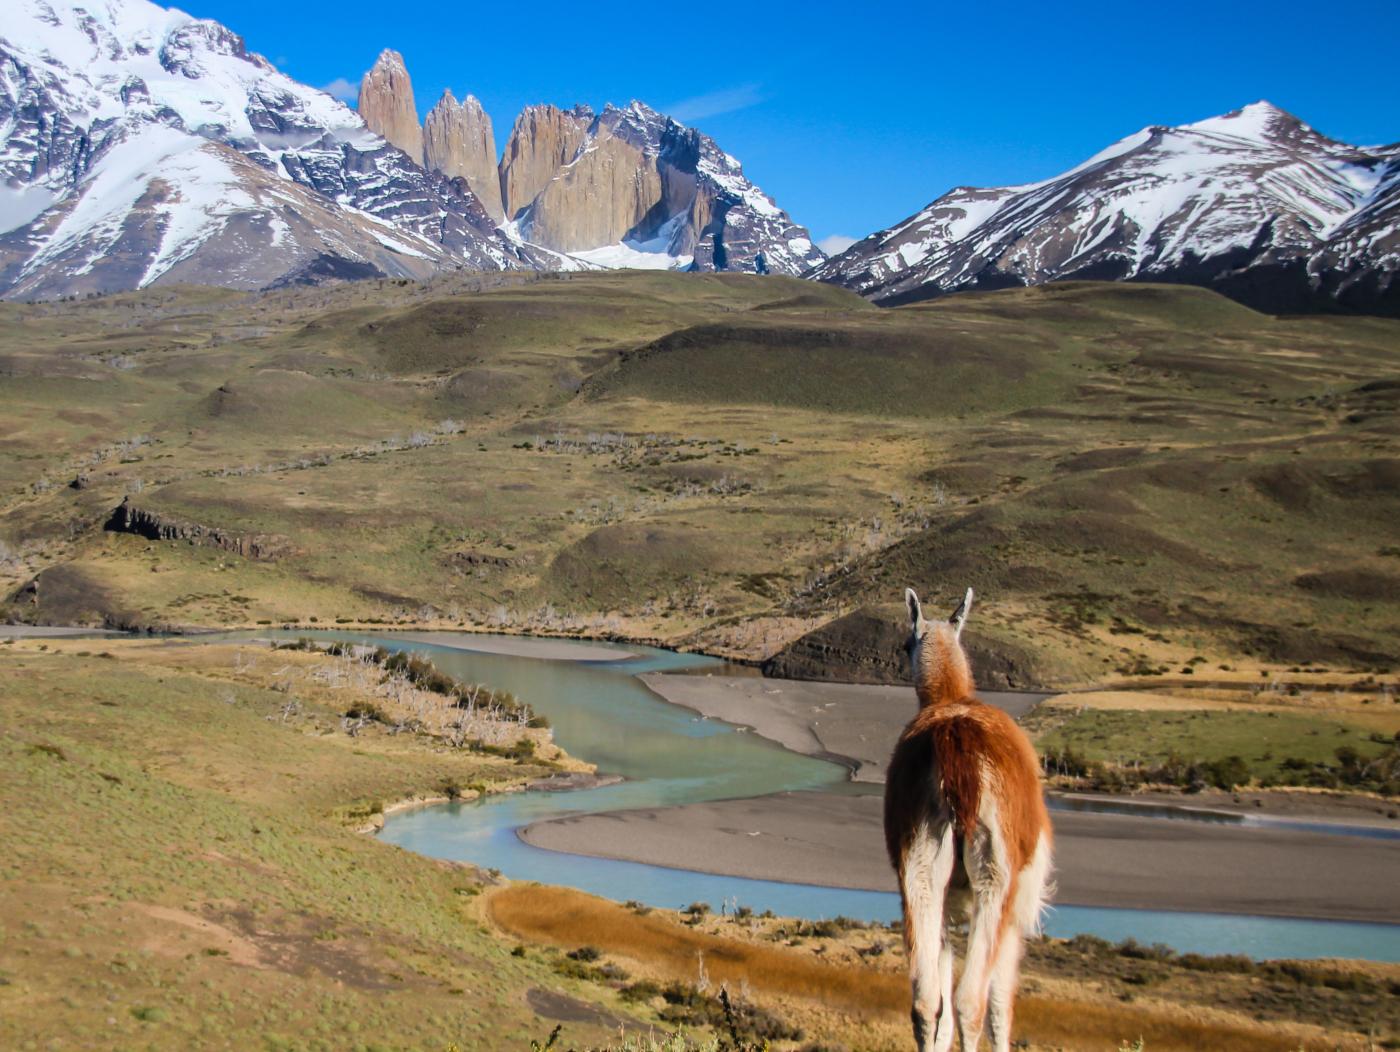 Imagen de las Torres del Paine